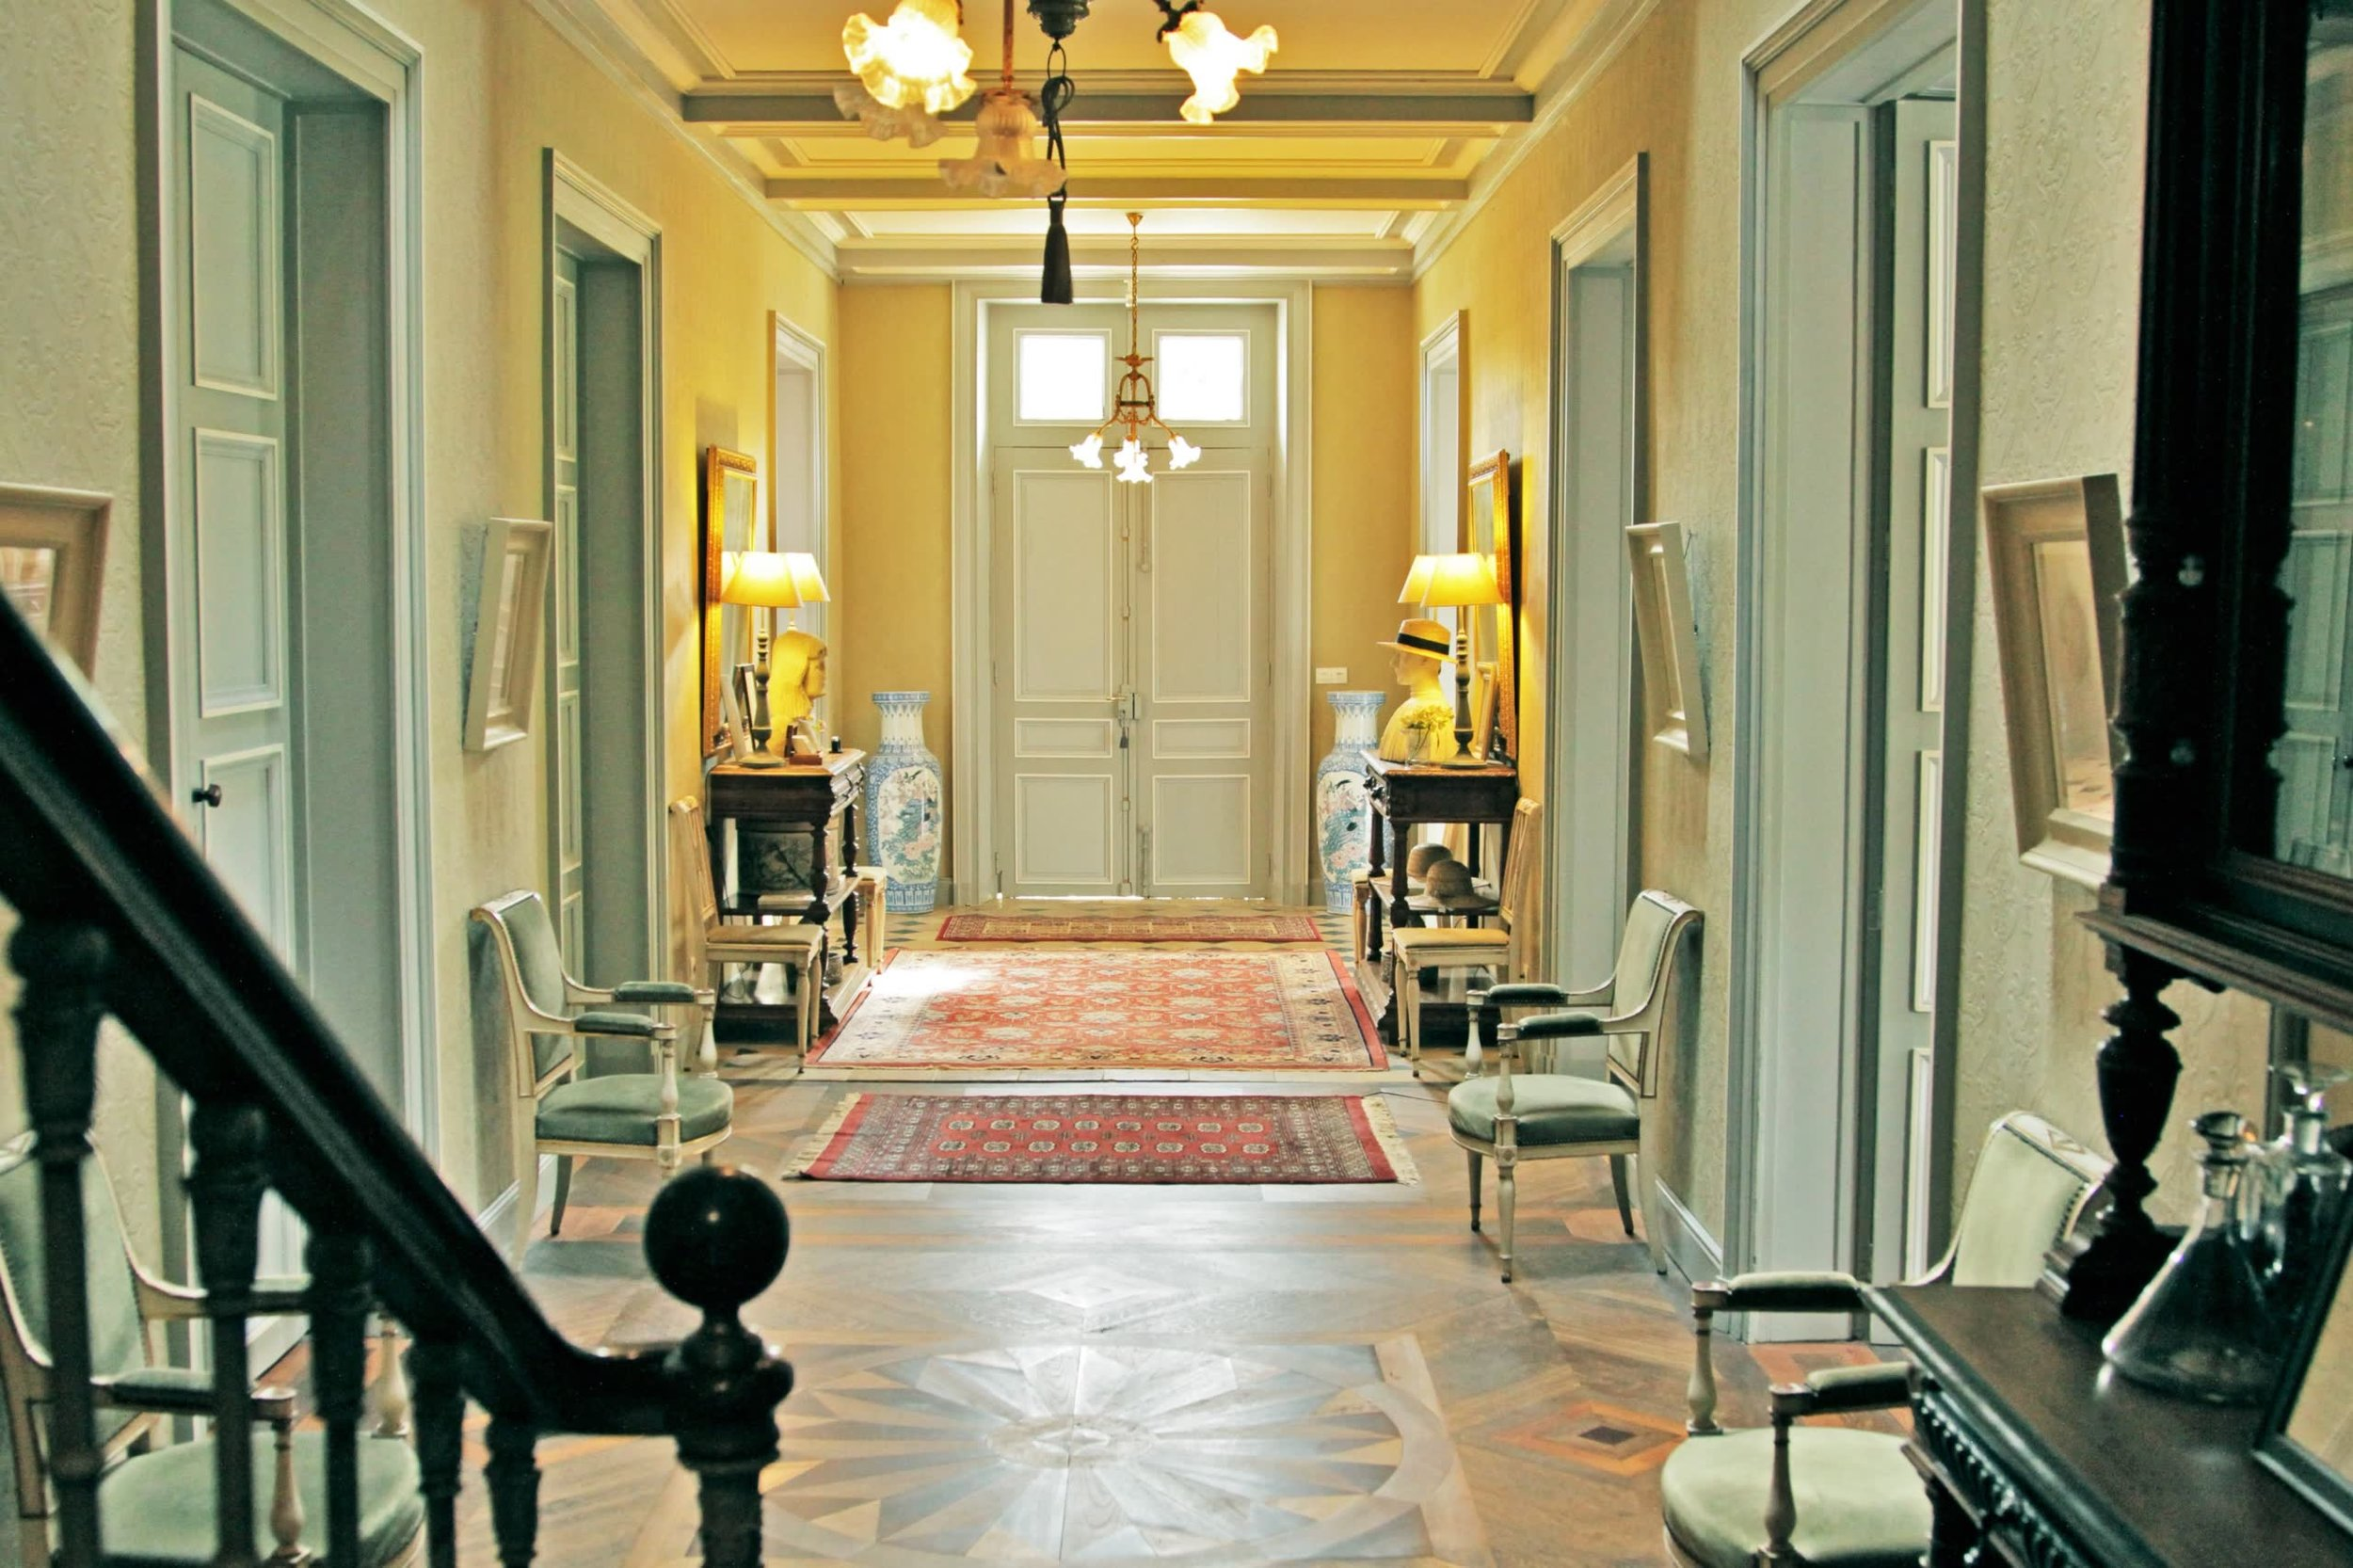 Chateau de la Pommeraye - charming boutique hotel chateau b&b spa normandy calvados Lobby(2).jpg